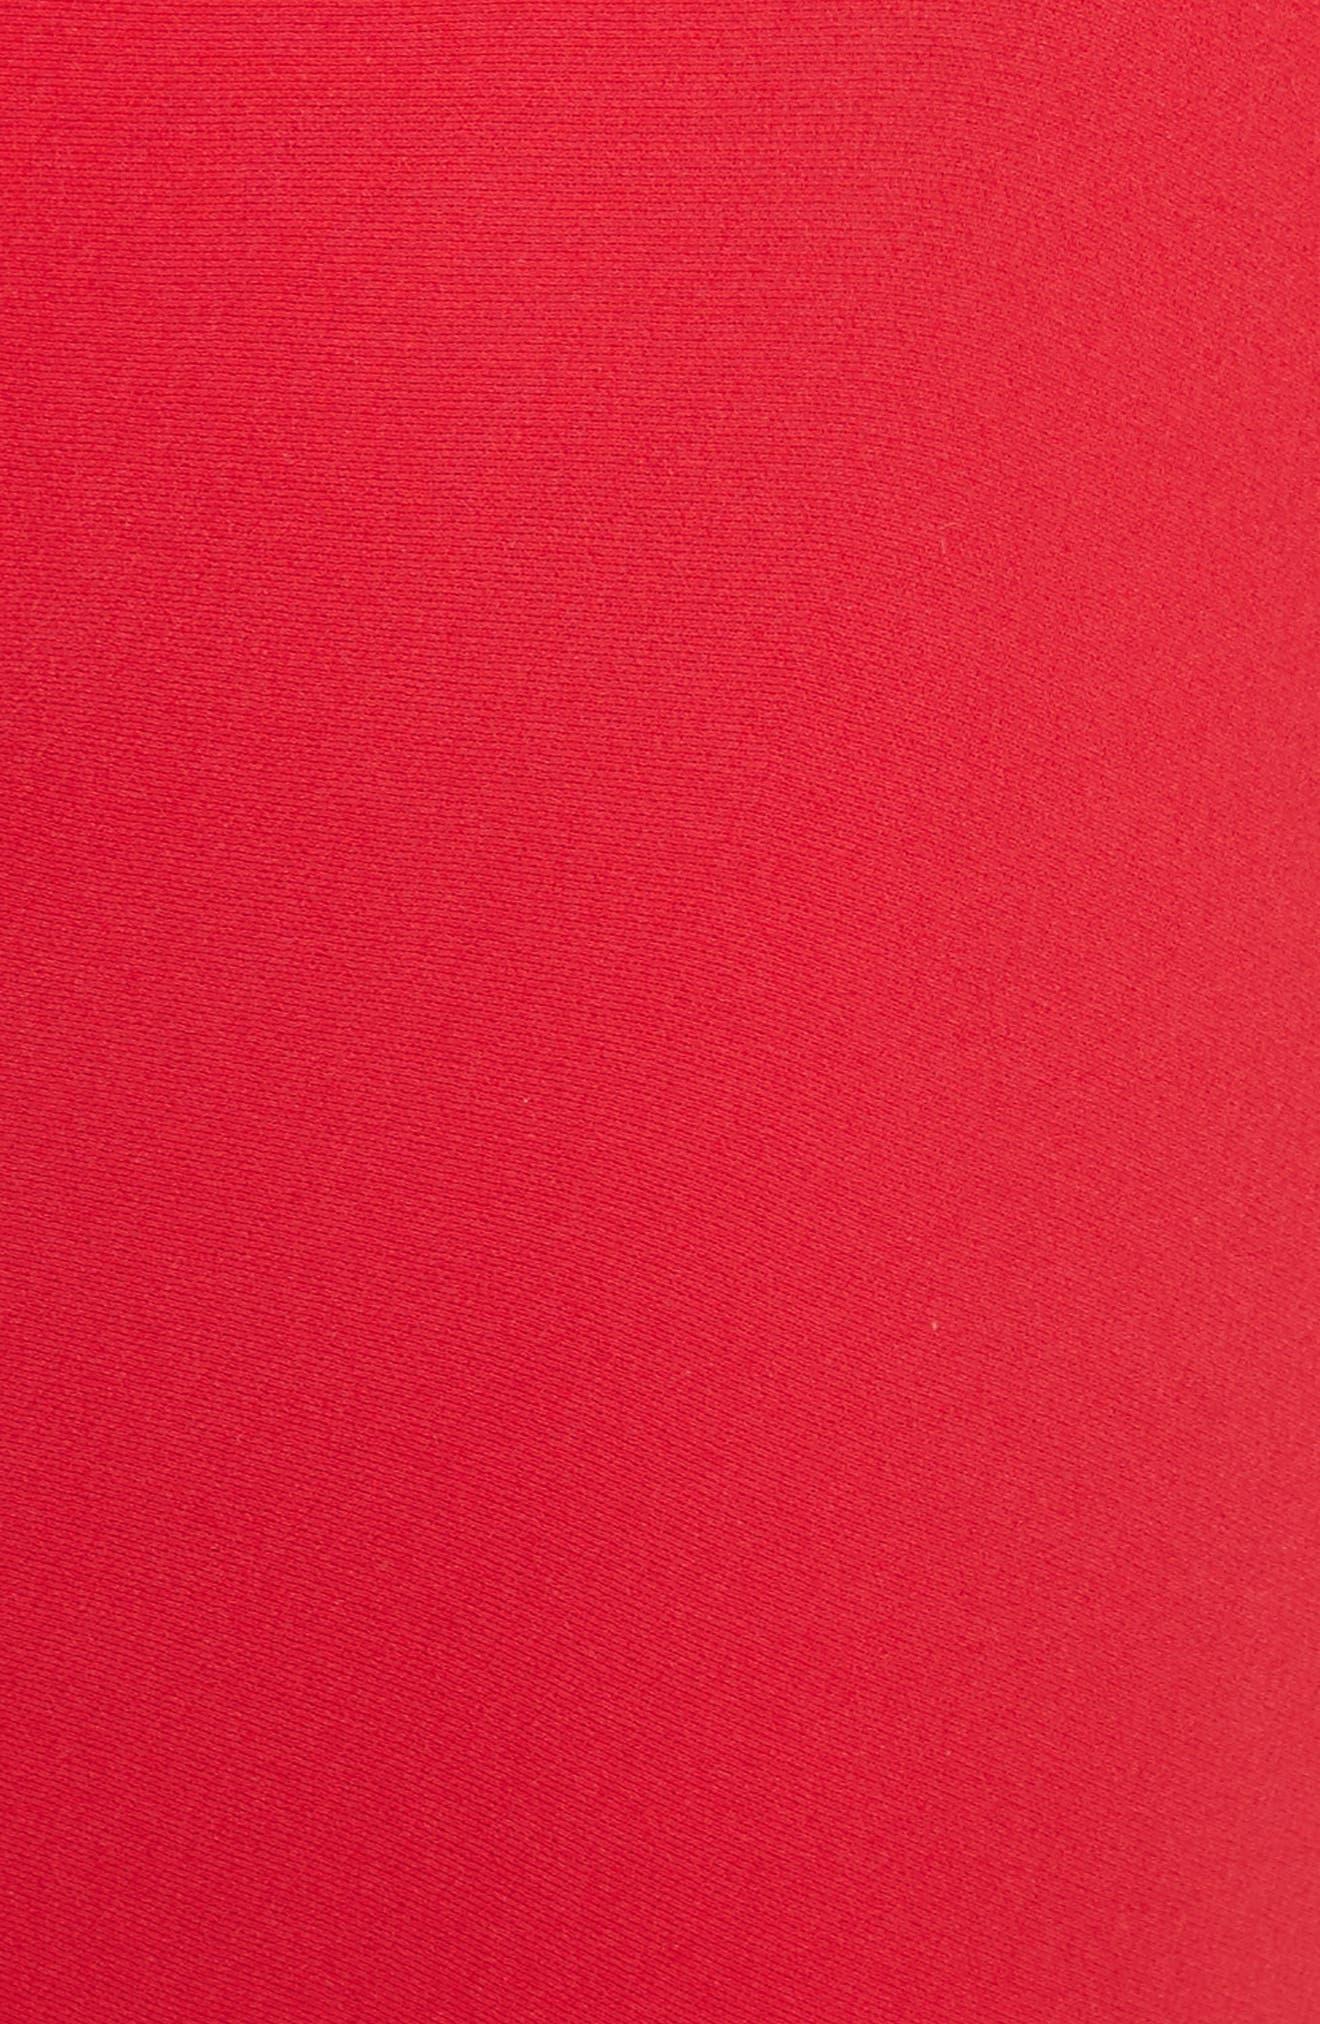 Ribbed Bodice Midi Dress,                             Alternate thumbnail 5, color,                             600